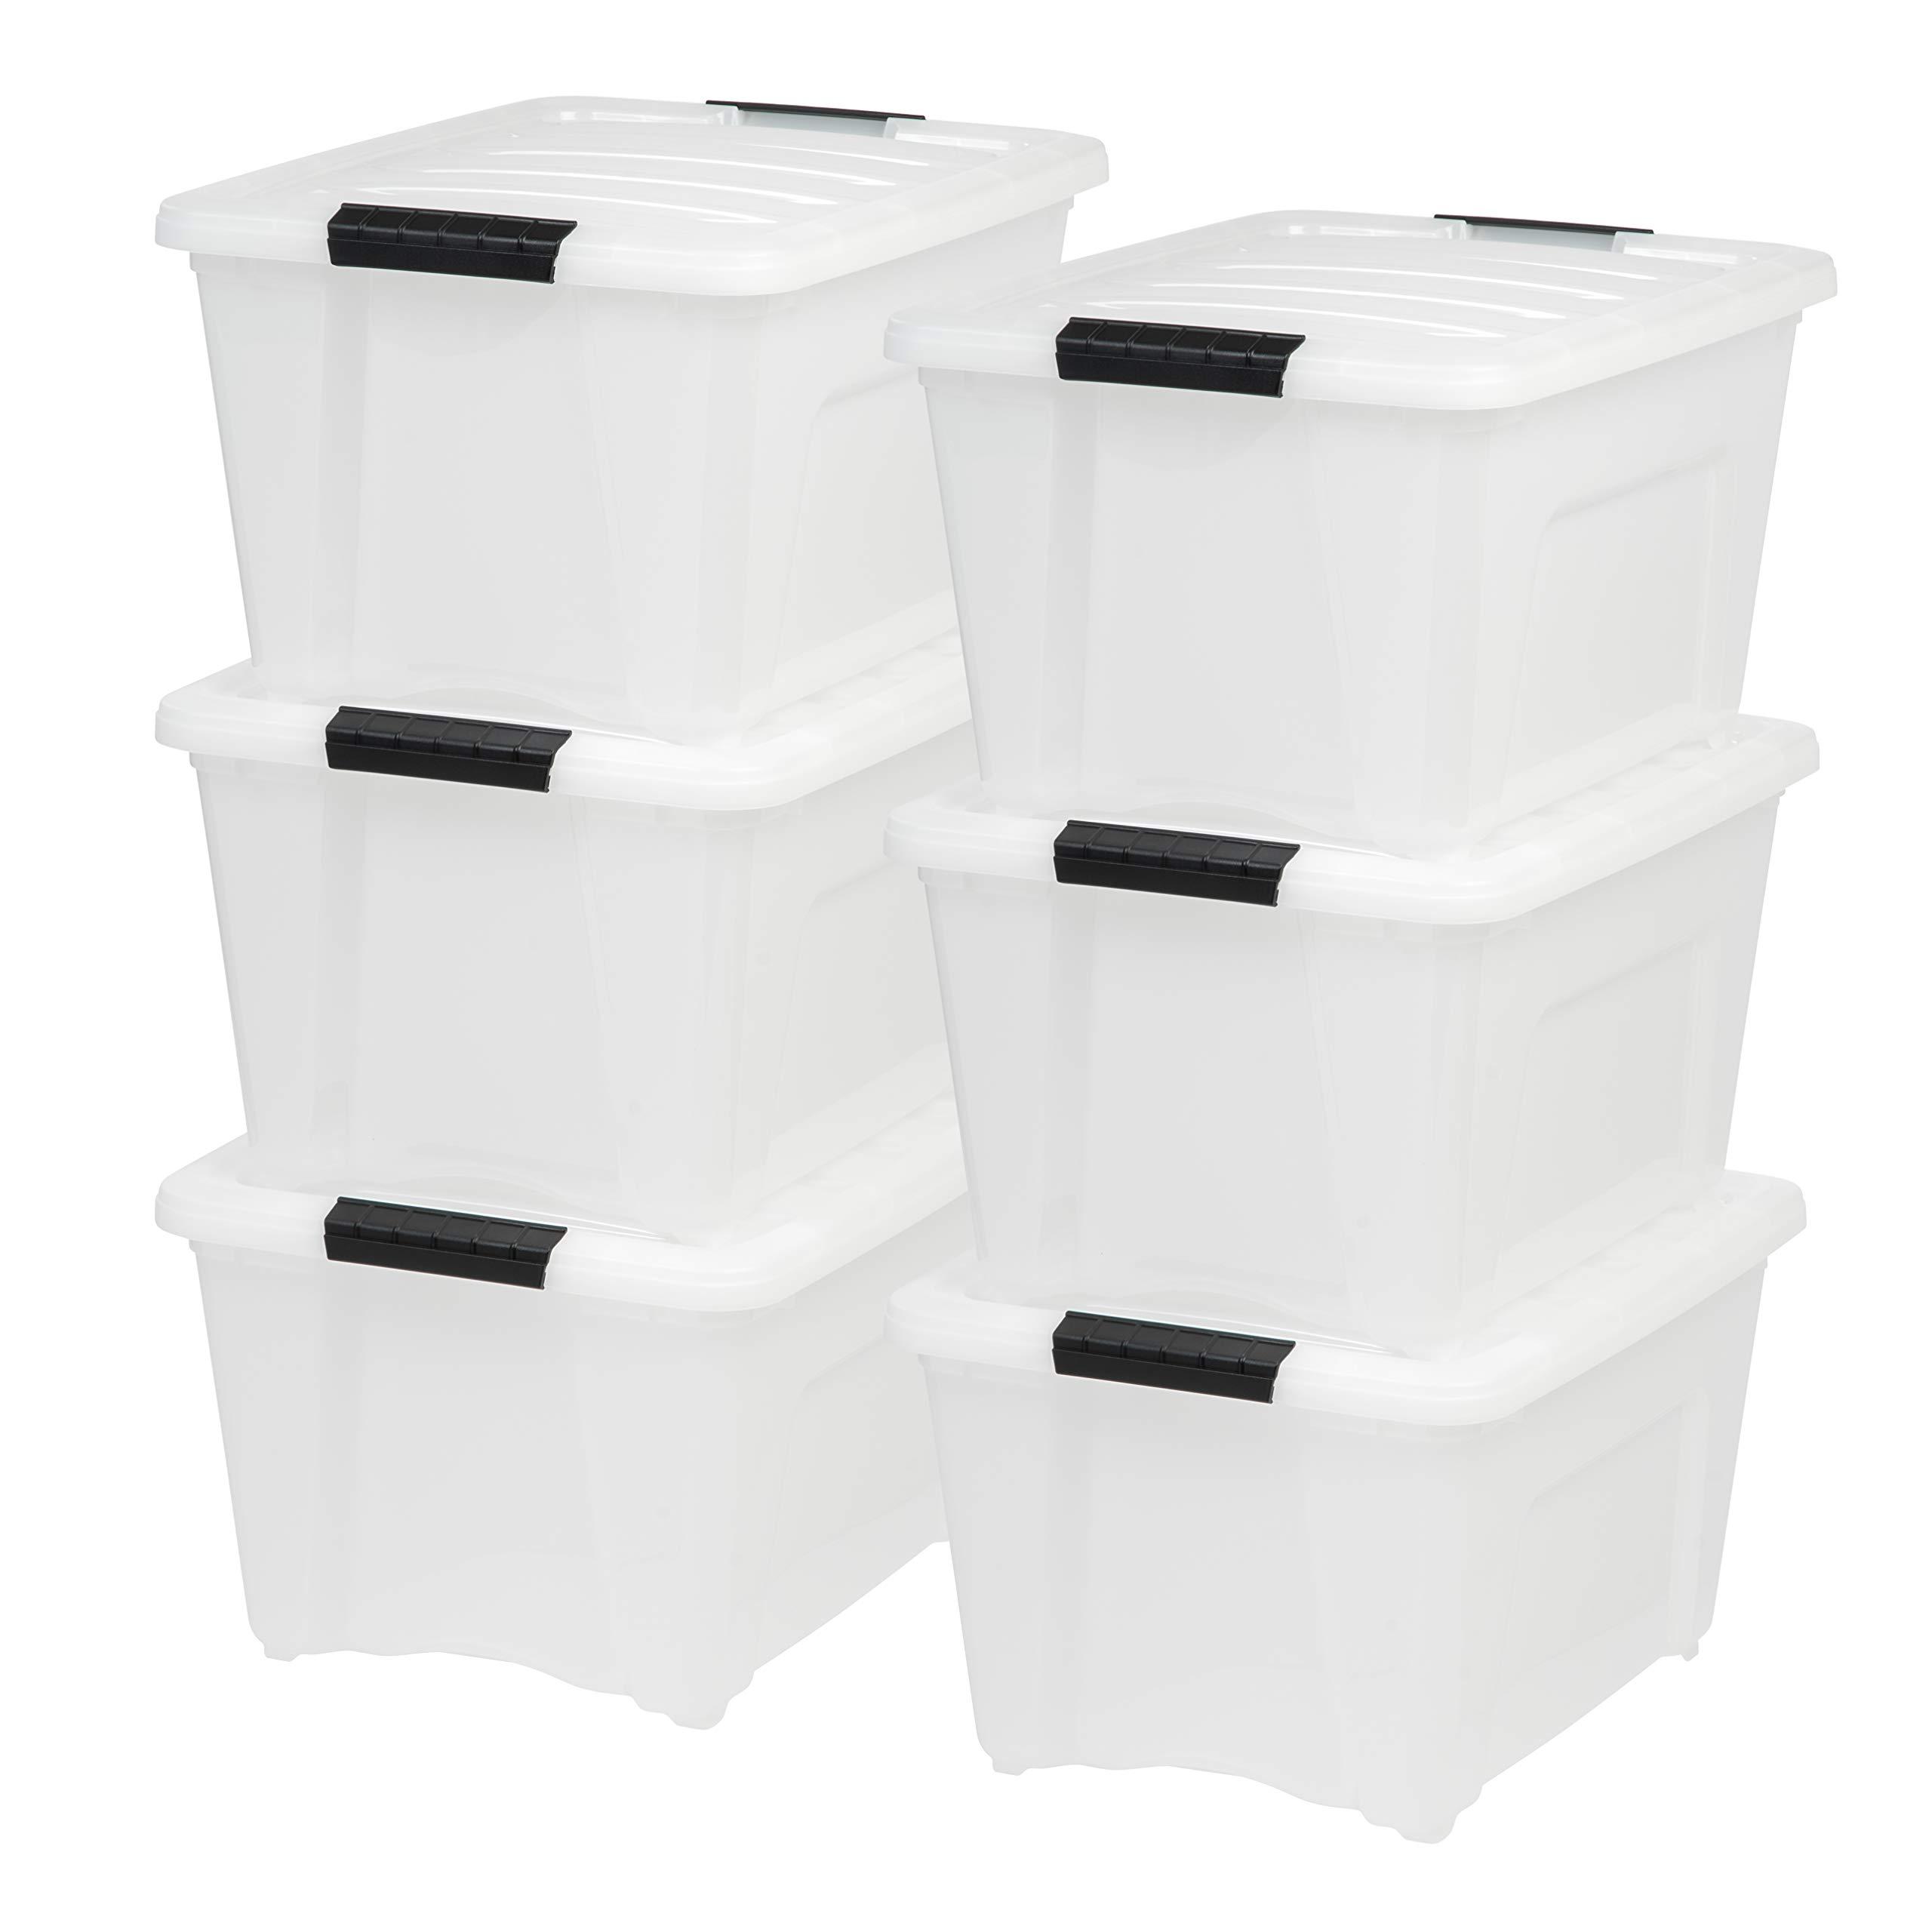 IRIS USA, Inc TB-28 32 Quart Stack & Pull Box, Multi-purpose Storage Bin, 6 Pack, Pearl by IRIS USA, Inc.